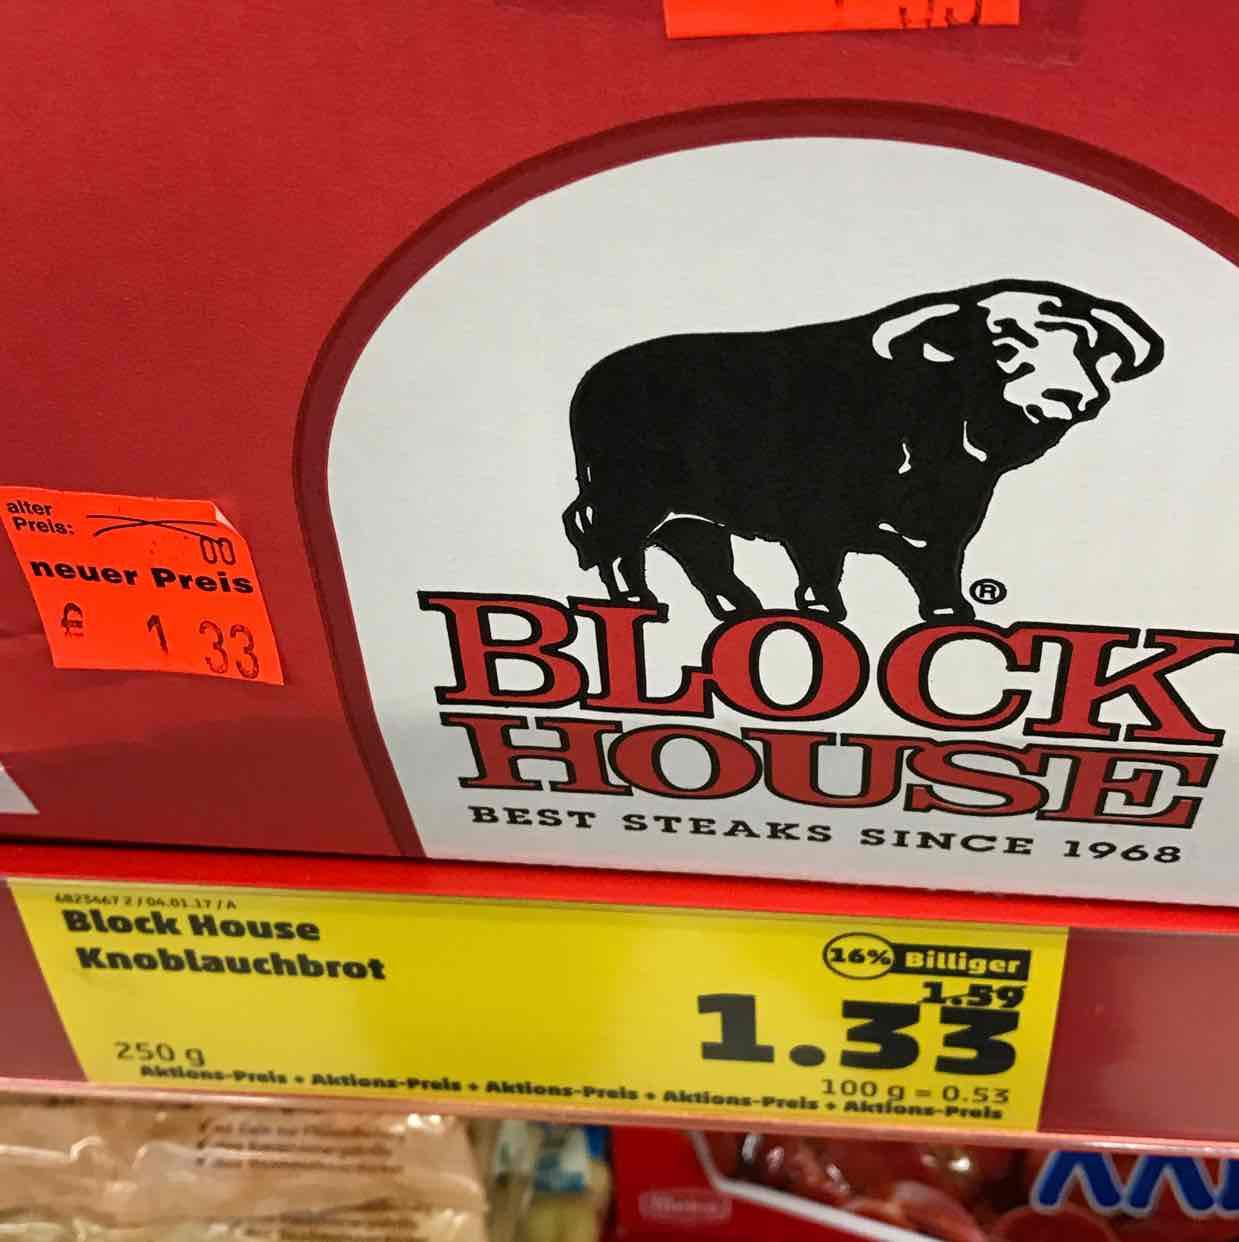 Lokal Penny HH Elbgaustrasse Blockhouse Brot nur 1,33 und Sourcreme nur 77 Cent